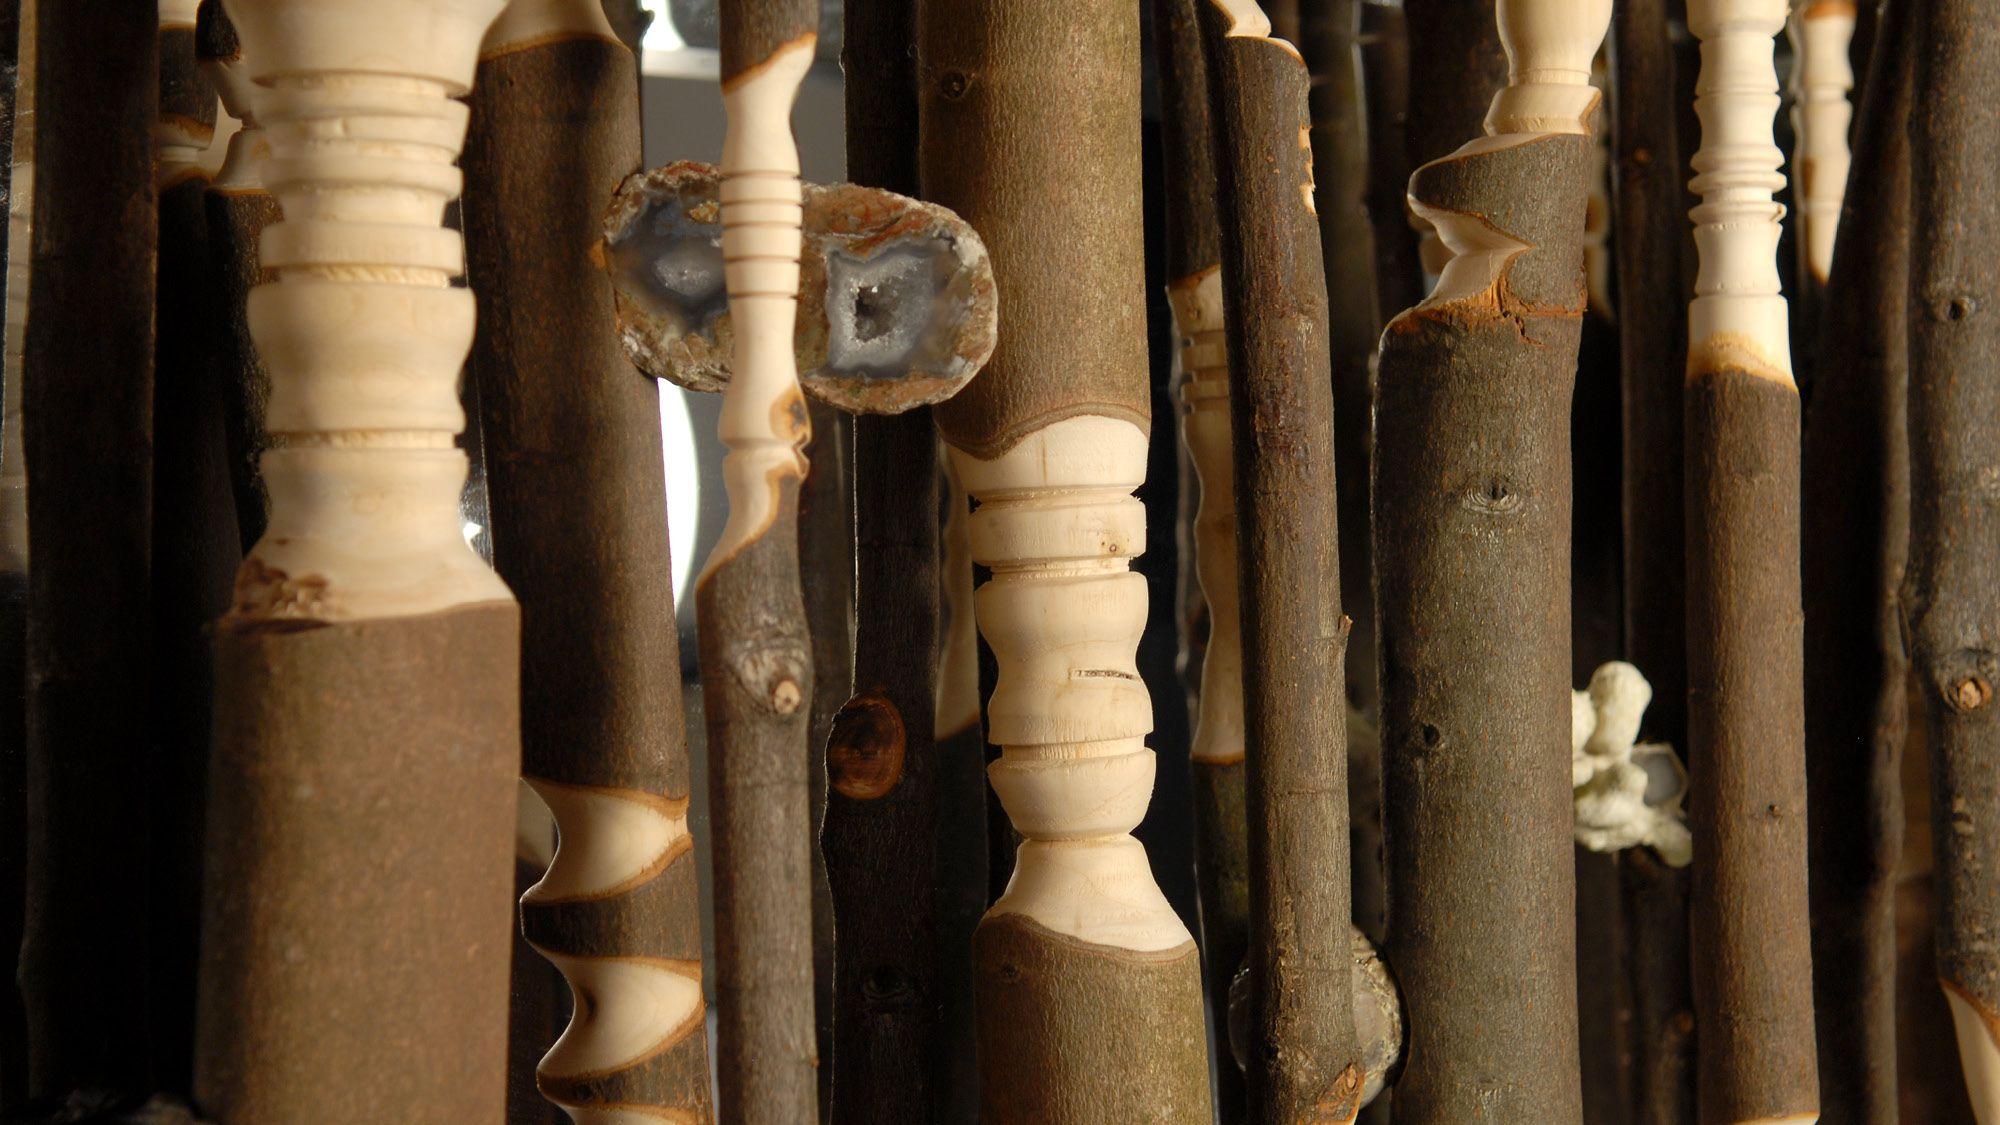 2012 Venice Biennale Wunderkammer Installation Arch  # Wunderkammer Muebles